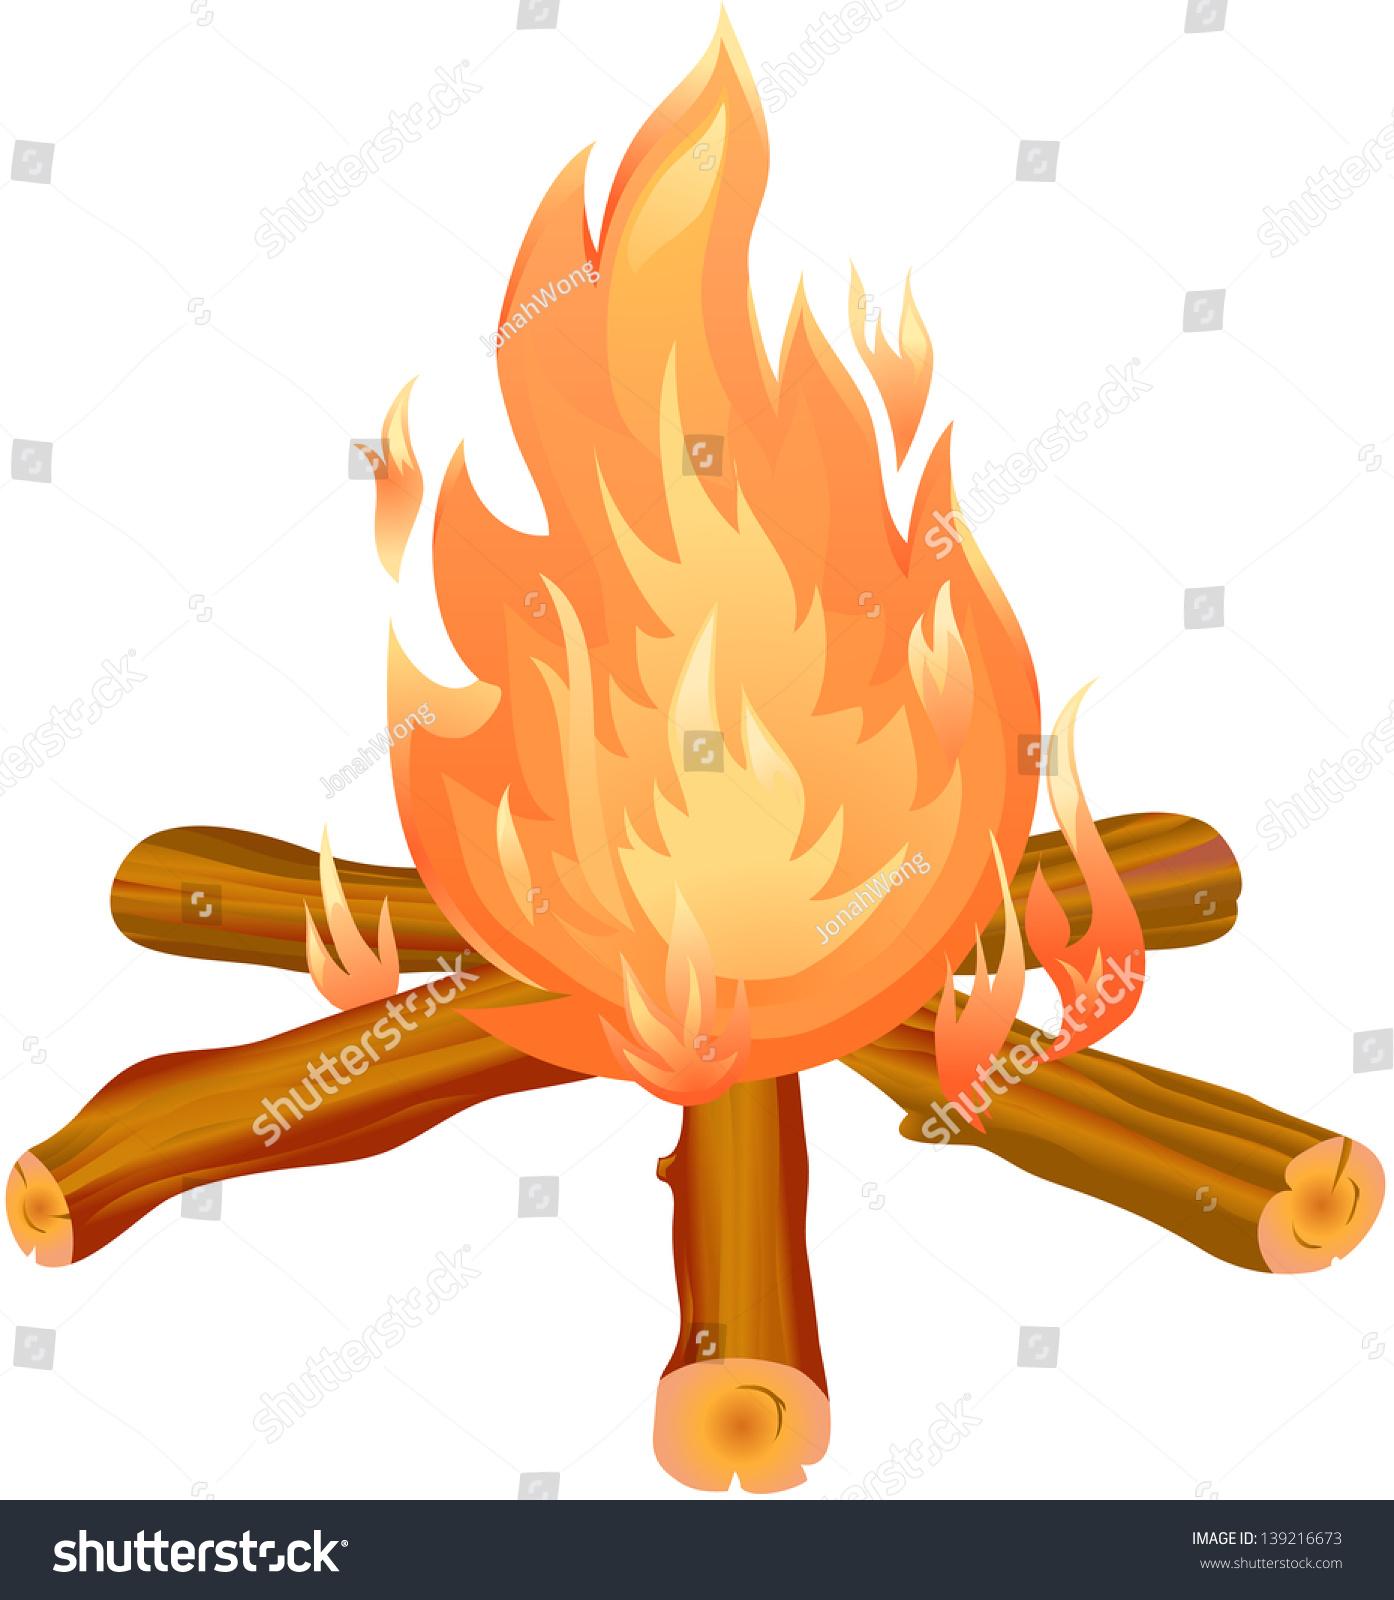 Clip Art Bonfire Clipart bonfire clipart stock vector 139216673 shutterstock clipart